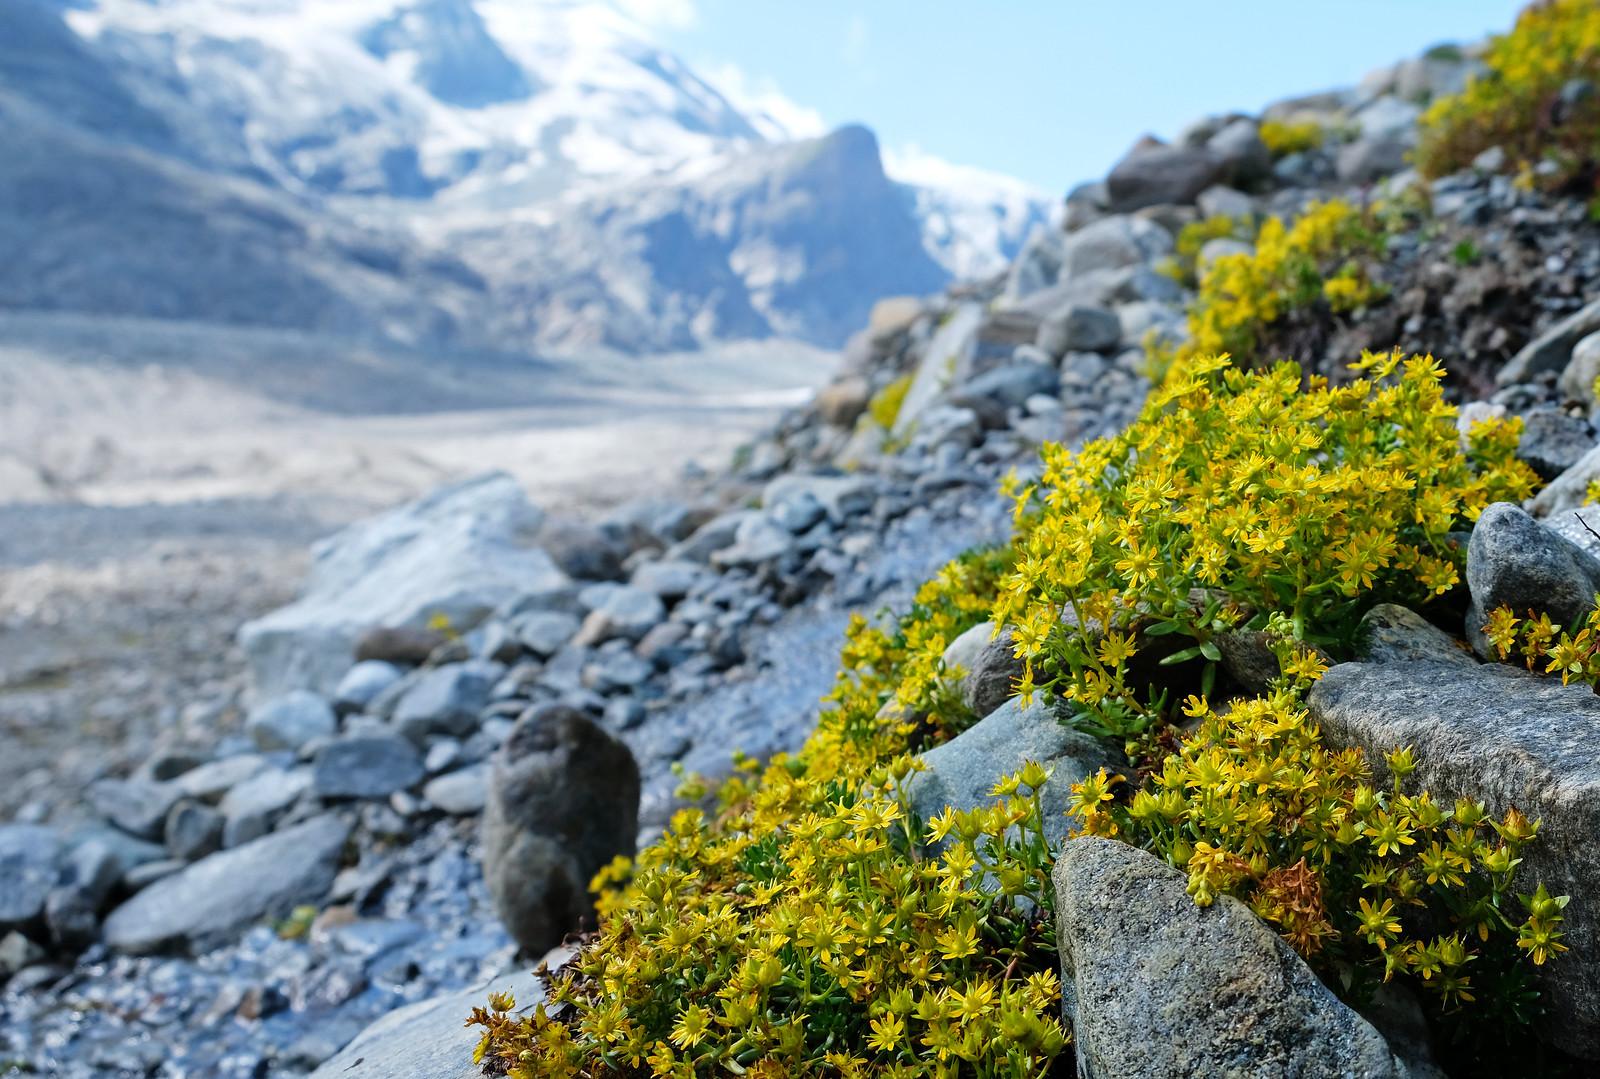 Pasterze Glacier Trail, Alps, Austria